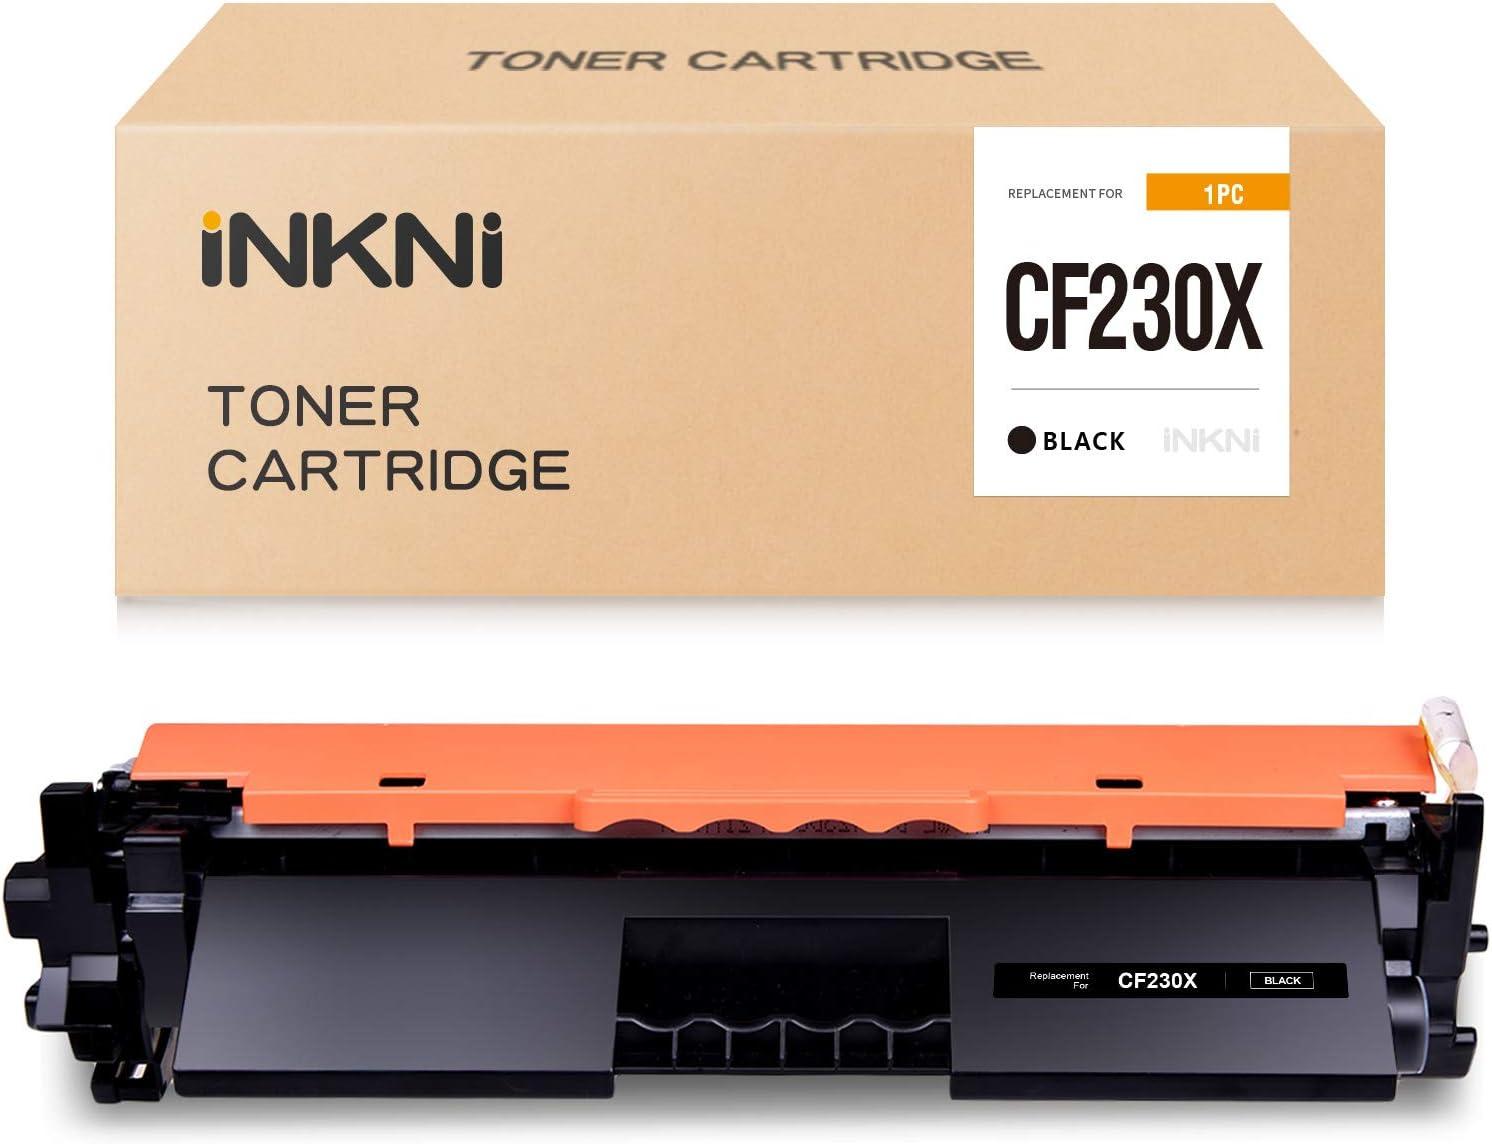 INKNI Compatible Toner Cartridge Replacement for HP 30A 30X CF230X CF-230X for Laserjet Pro MFP M227fdw M203dw M227fdn M203d M203dn M227sdn M227d Printer (Black, 1 Pack)